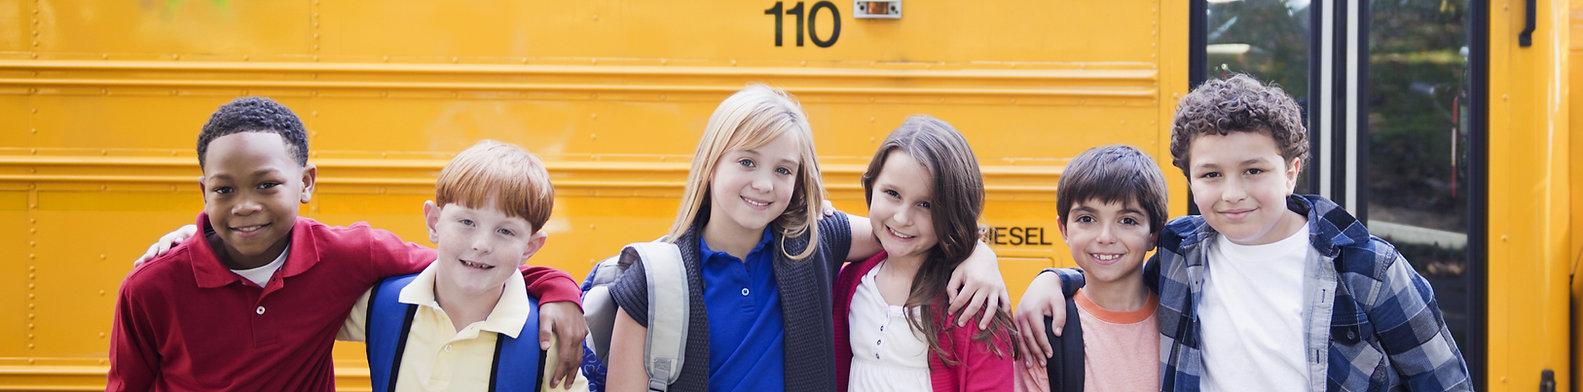 After School Program Kids